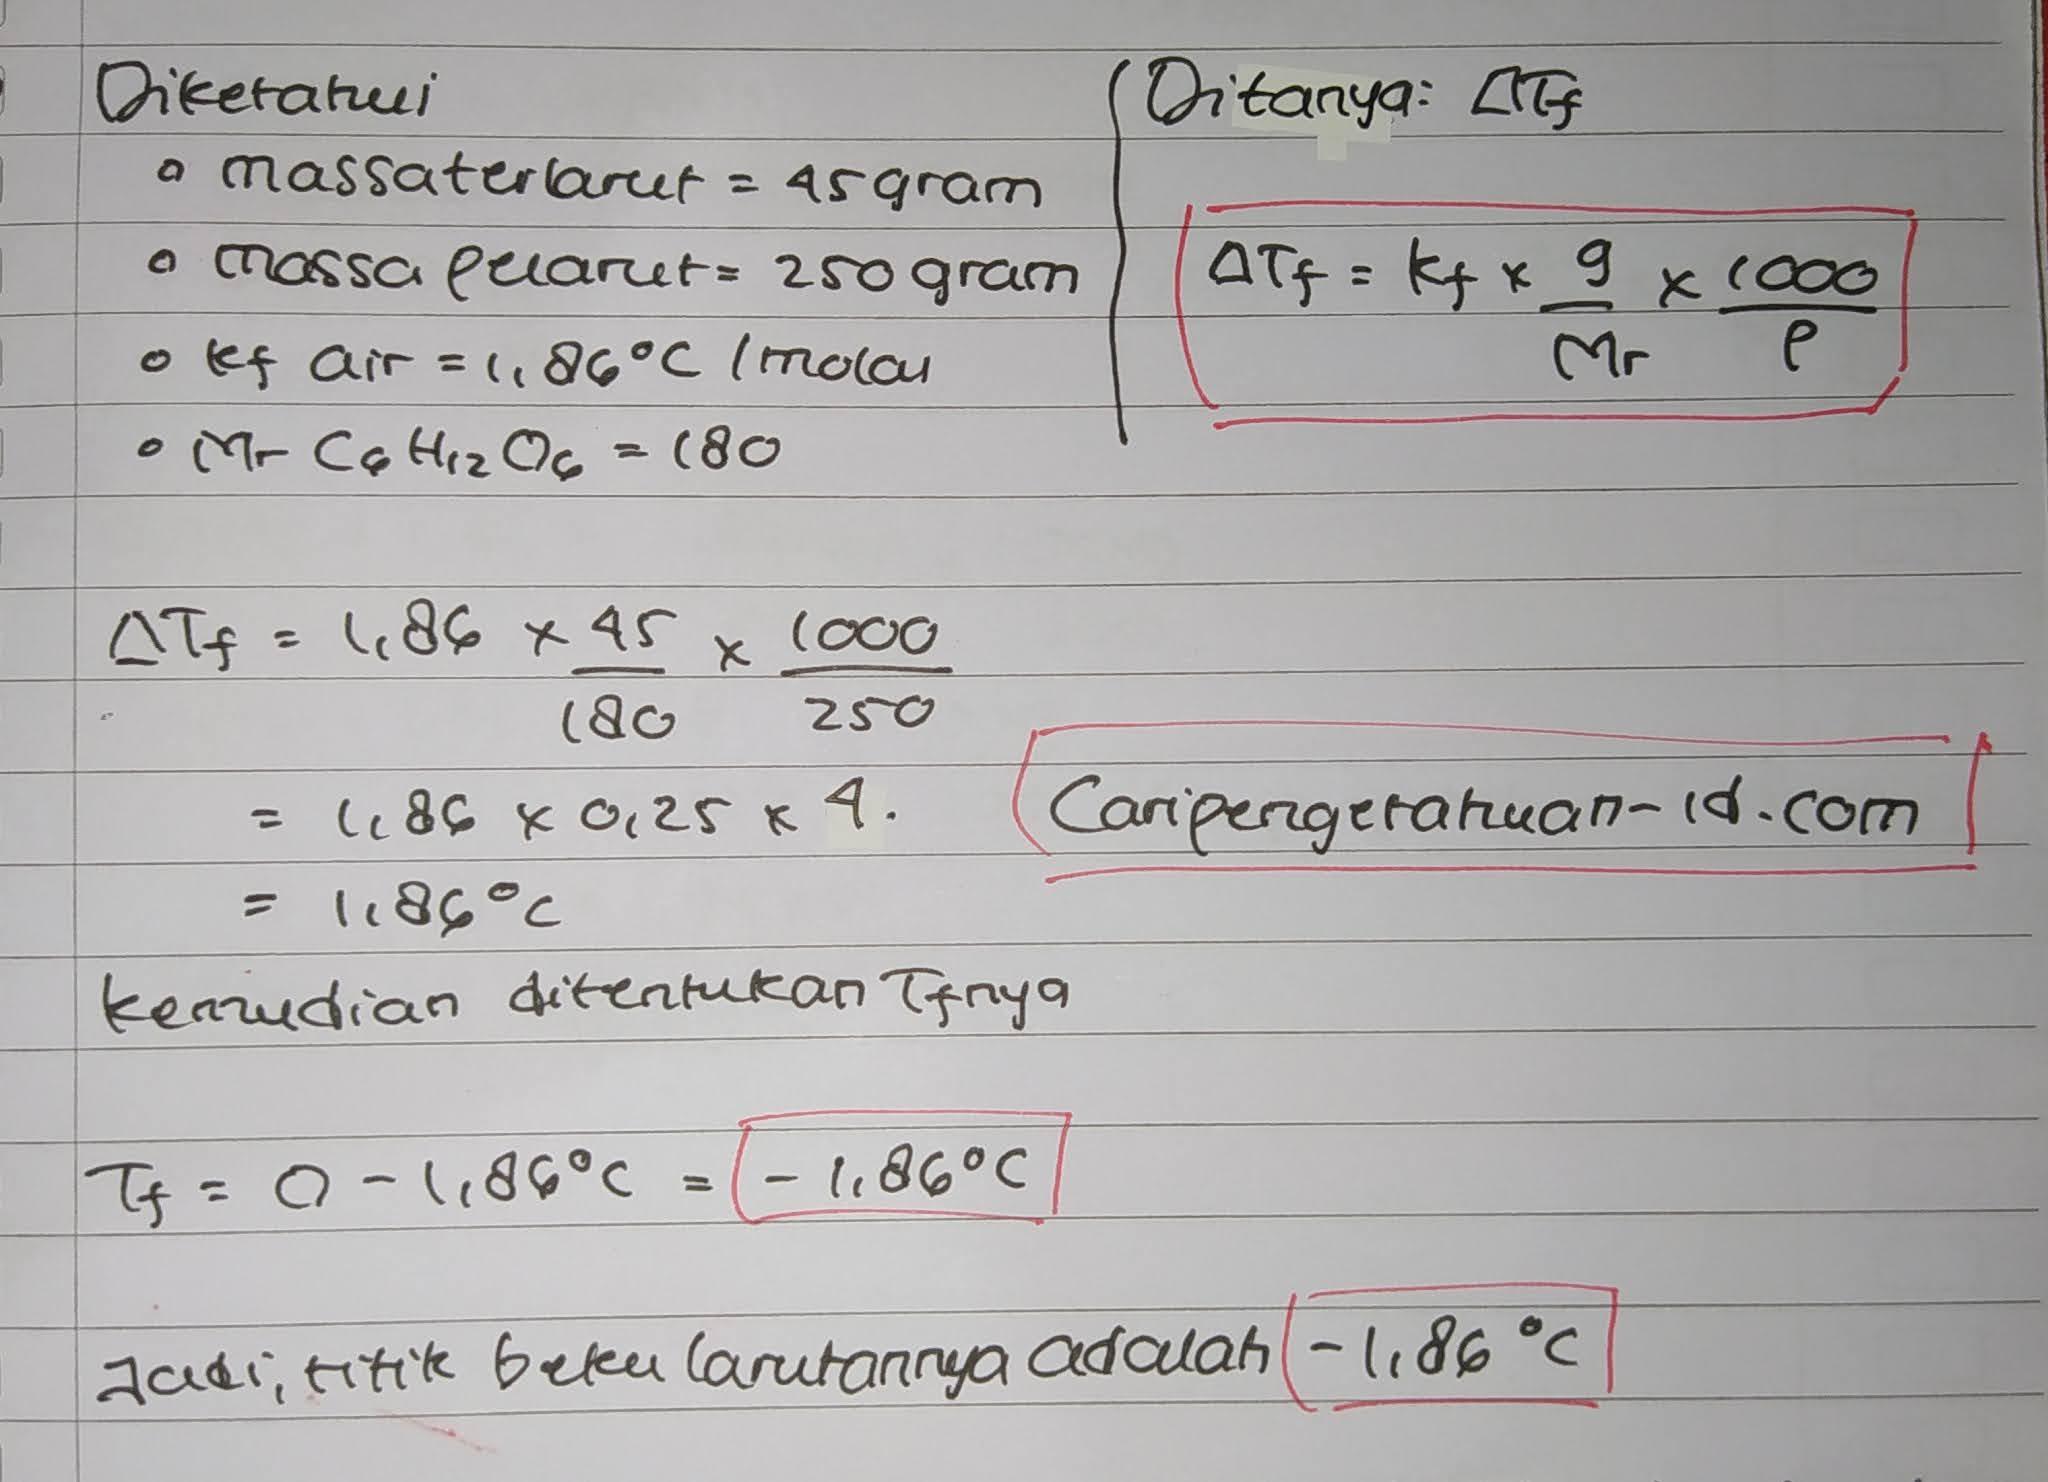 dilarutkan dalam 250 gram air (Kf air = 1,86°C/molal). Jika diketahui Ar C = 12, H = 1, dan O = 16 maka titik beku larutan tersebut adalah